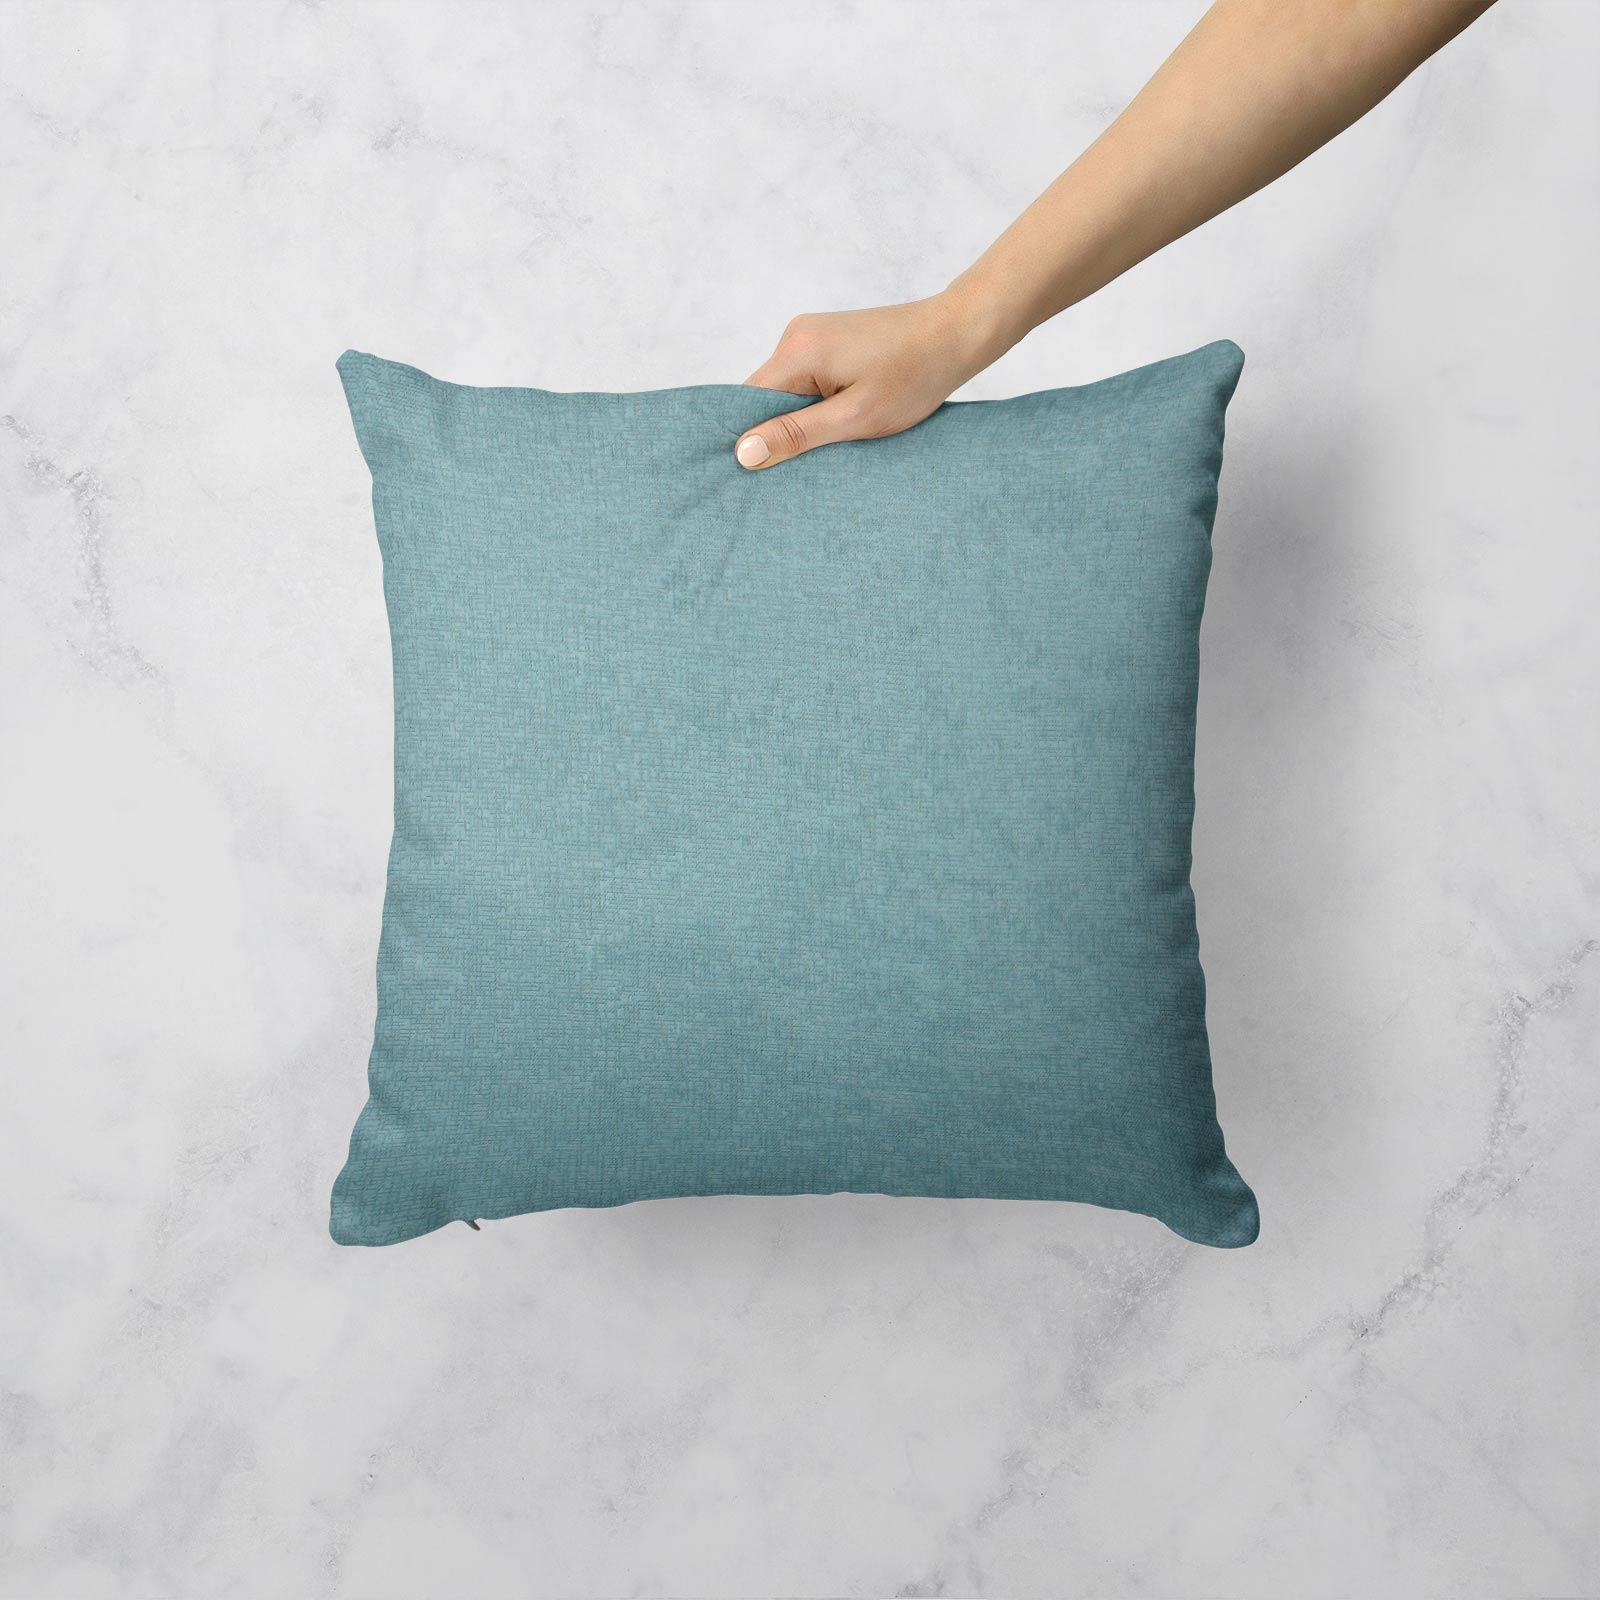 Teal-Blue-Duck-Egg-Cushion-Covers-18-034-x18-034-45cm-x-45cm-Luxury-Cover thumbnail 12